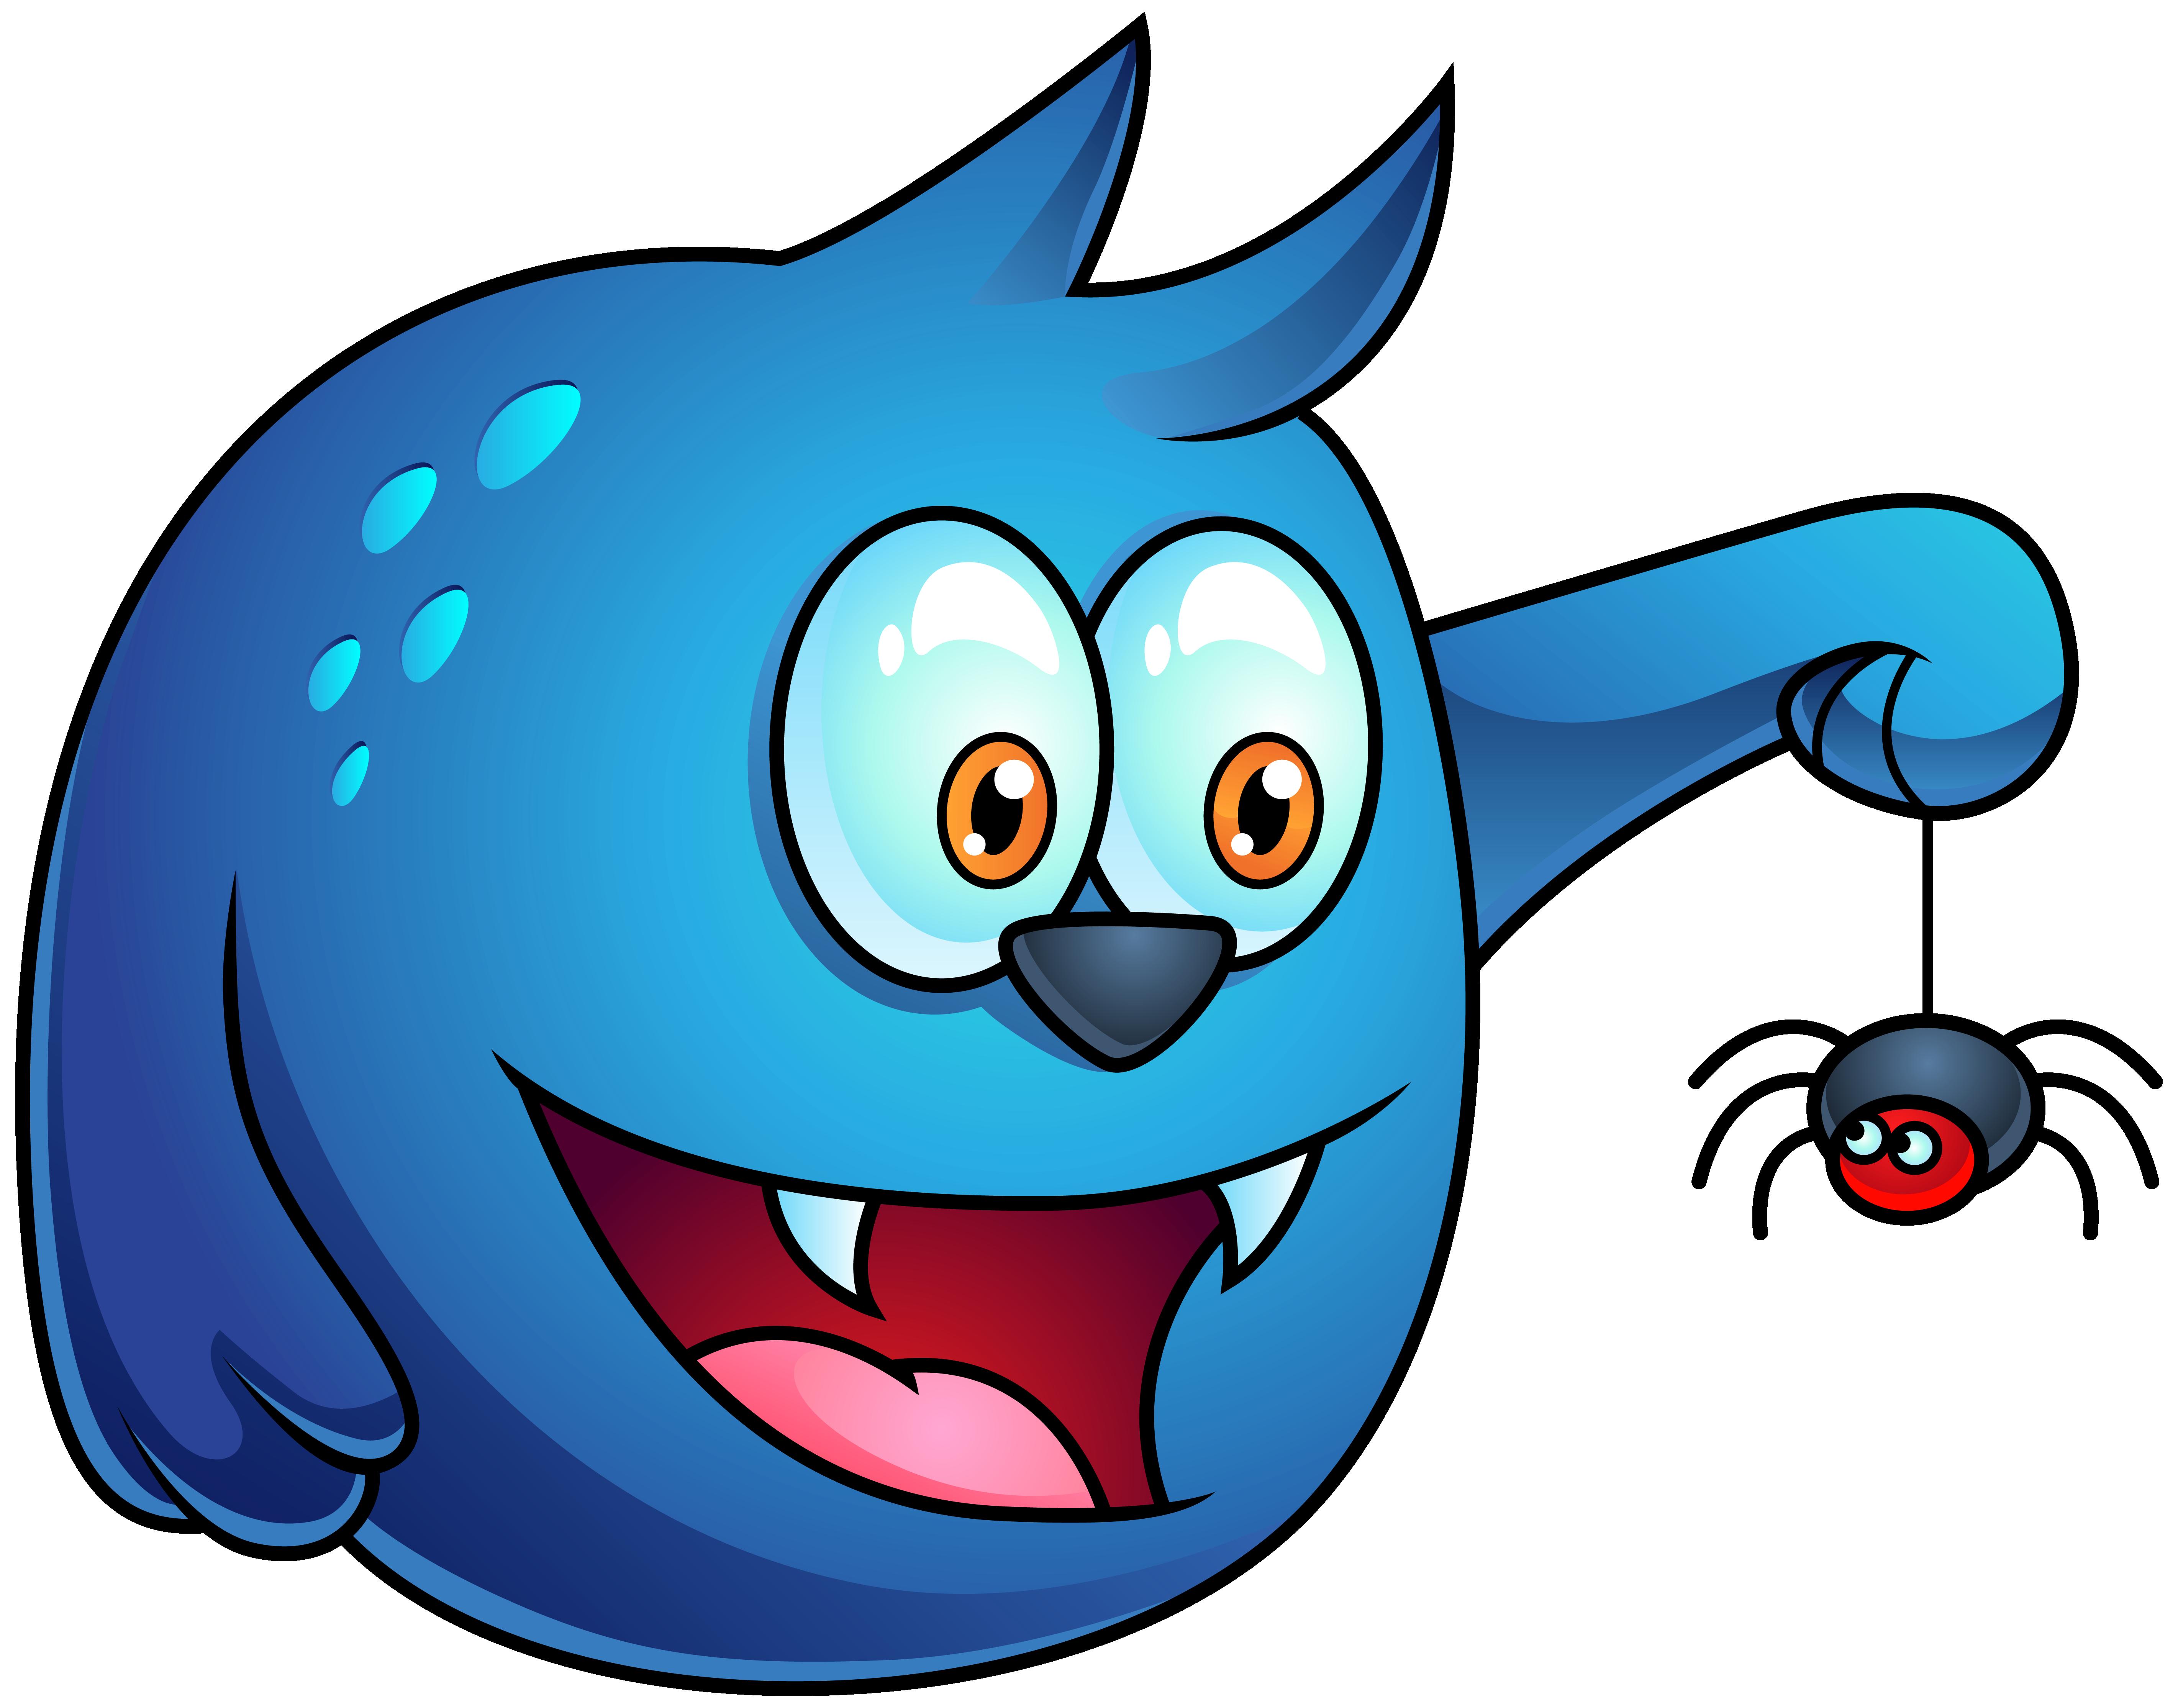 5685x4458 Blue Halloween Monster Png Clipart Imageu200b Gallery Yopriceville